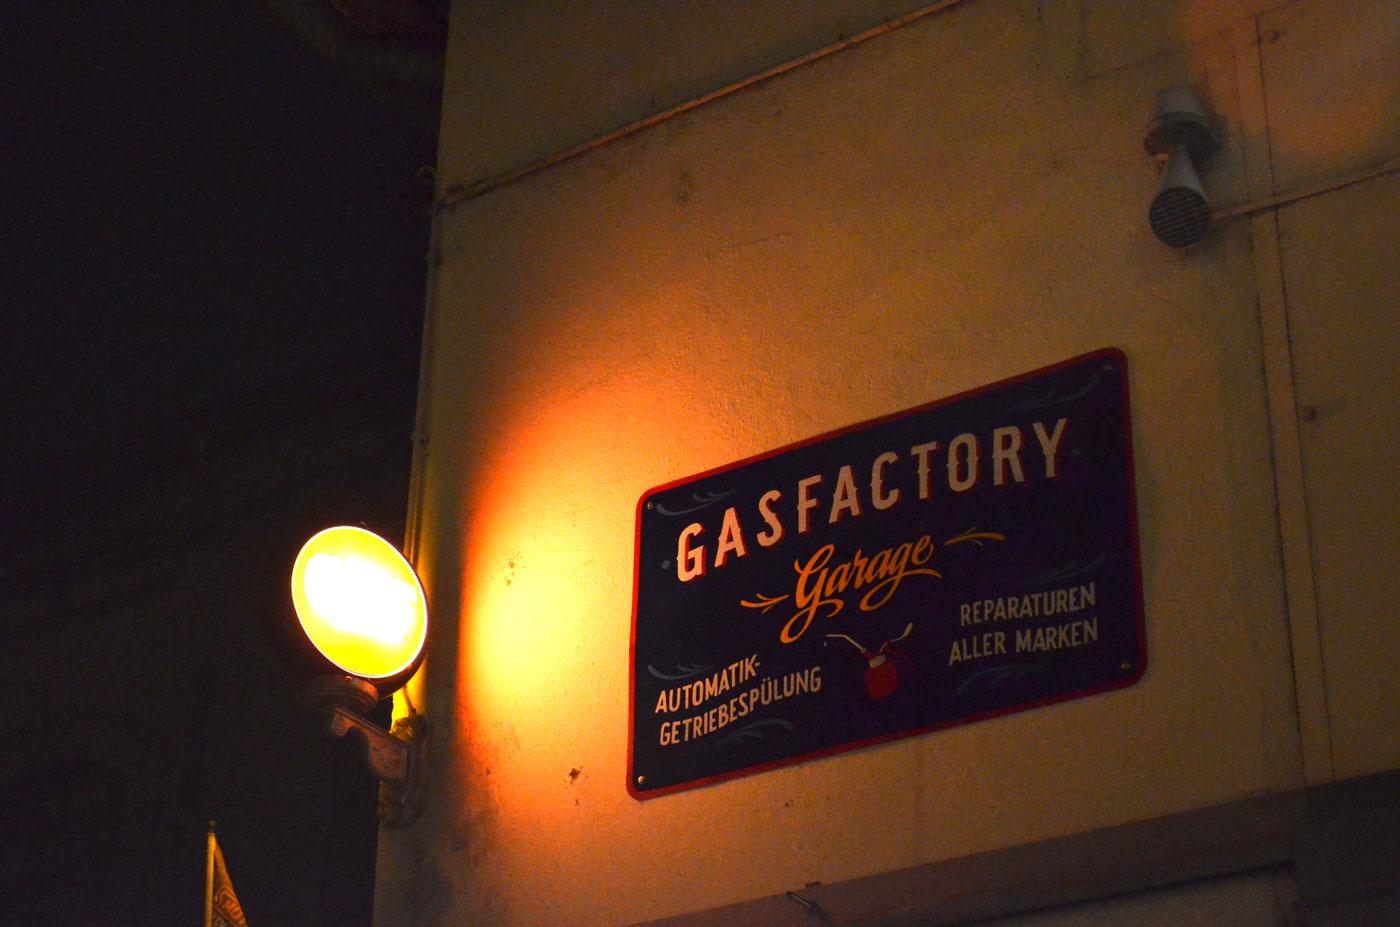 garage_gasfactory-home